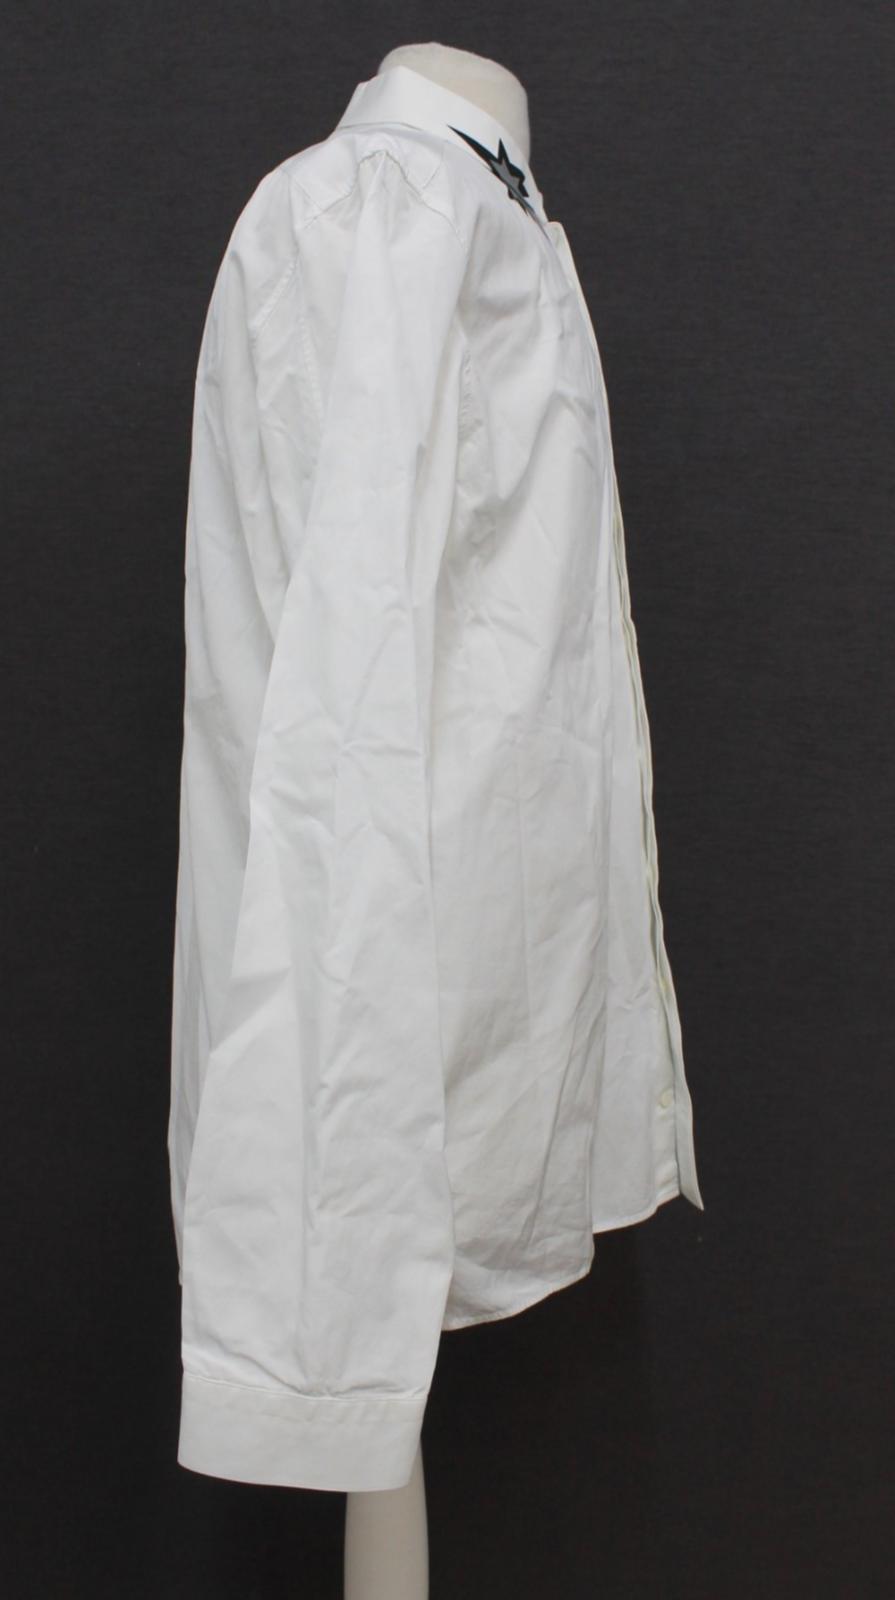 Neil-Barrett-para-hombre-calce-cenido-de-algodon-blanco-cuello-flash-camisa-de-manga-larga-talla-17 miniatura 4